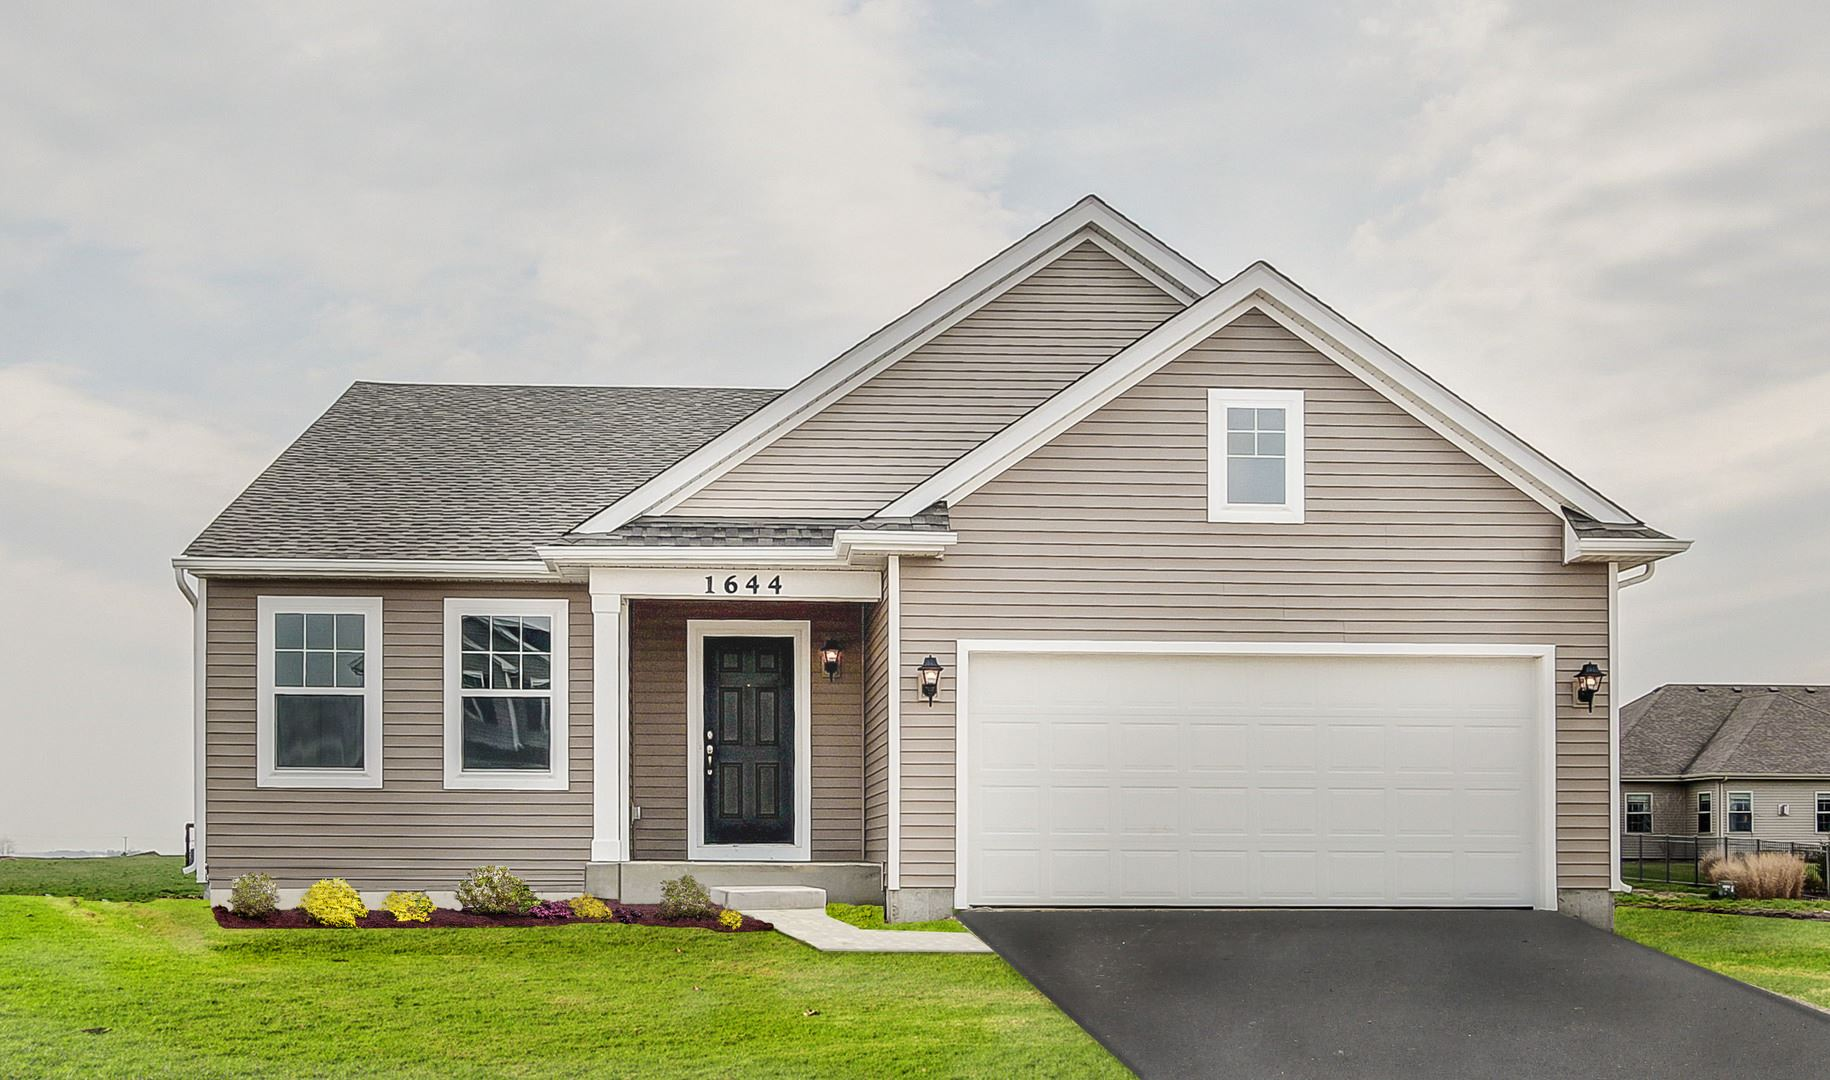 1644 Shetland Lane, Yorkville, IL 60560 - #: 10760050